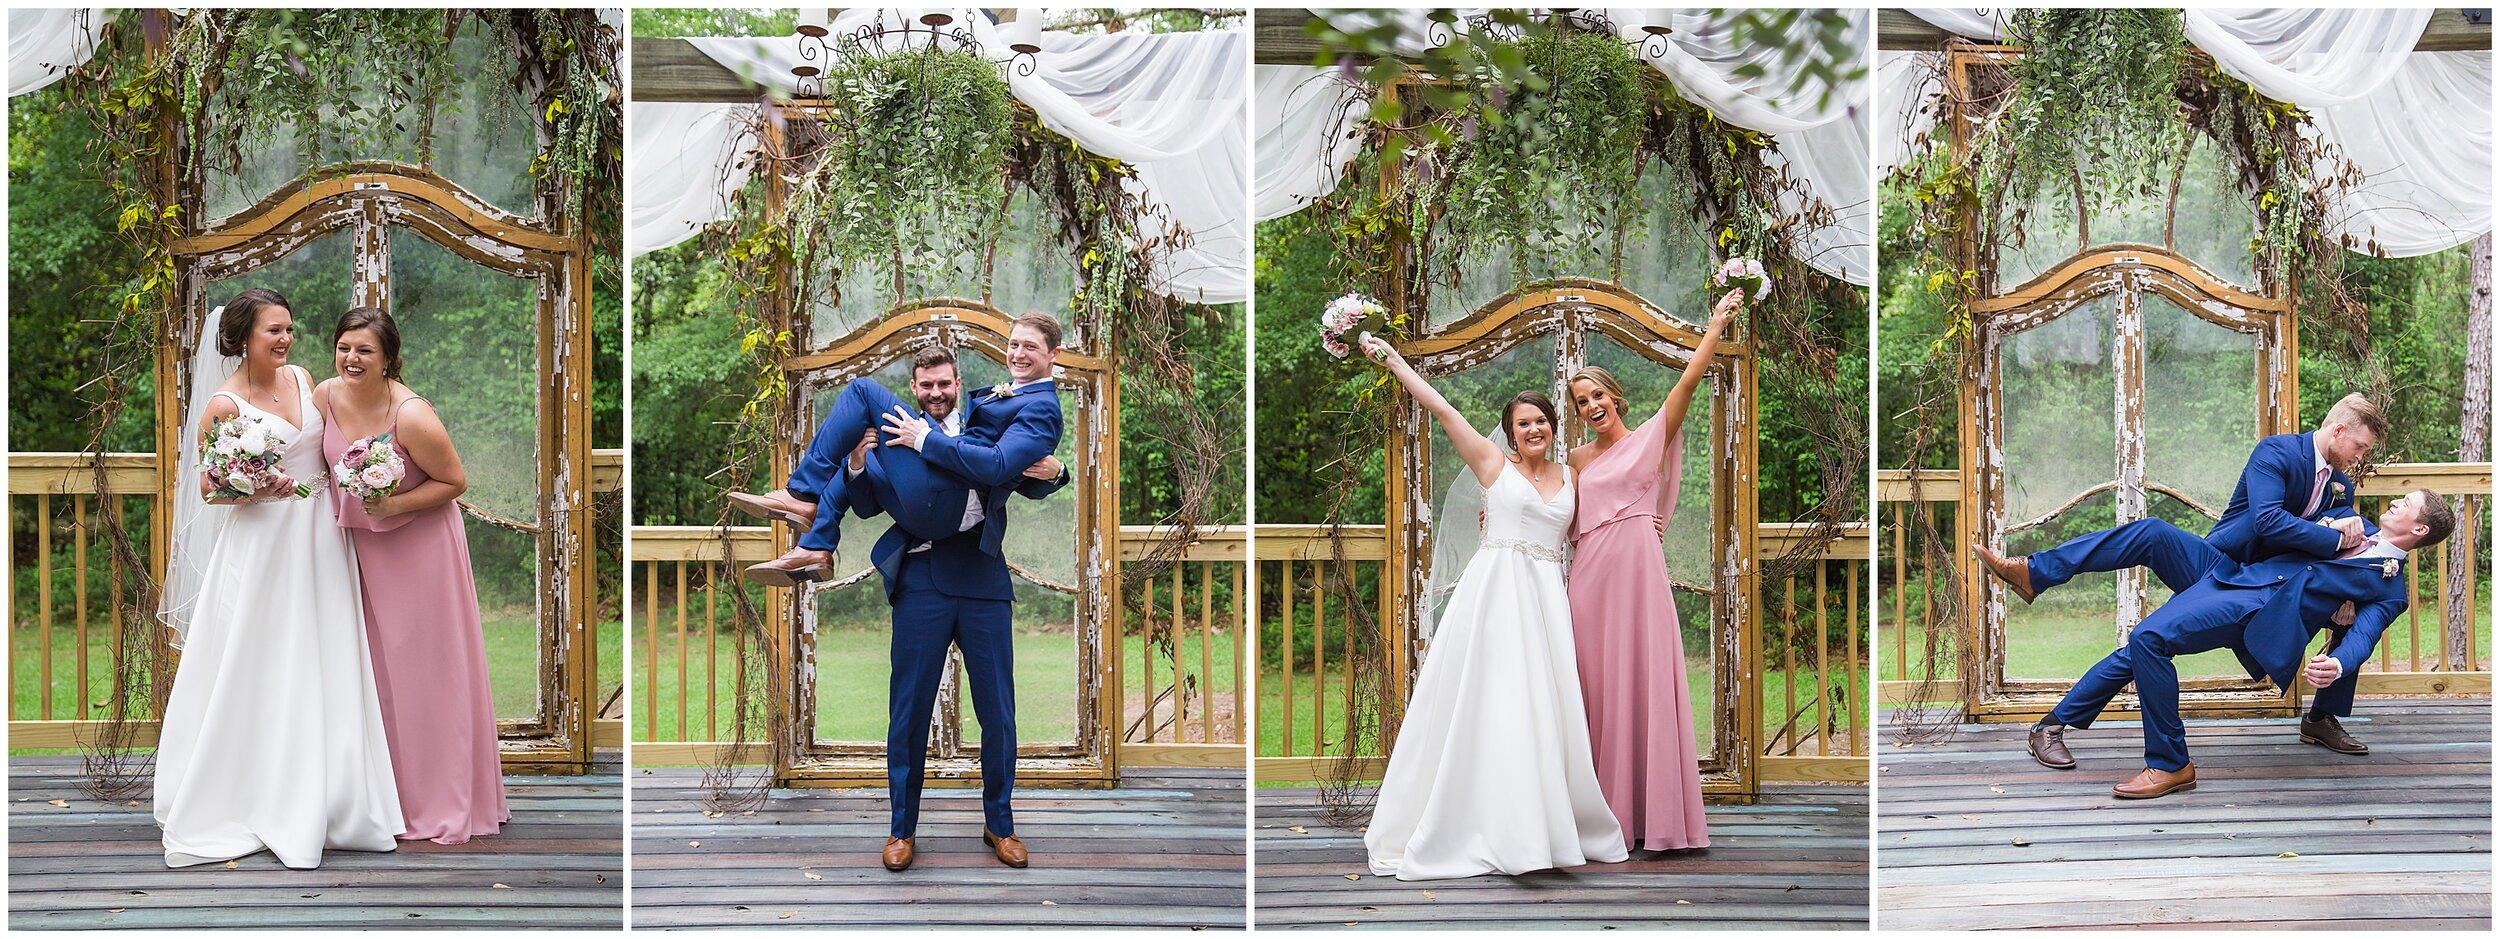 Bella Sera Gardens Alabama Wedding Photographer Videography Briana Zac_0021.jpg